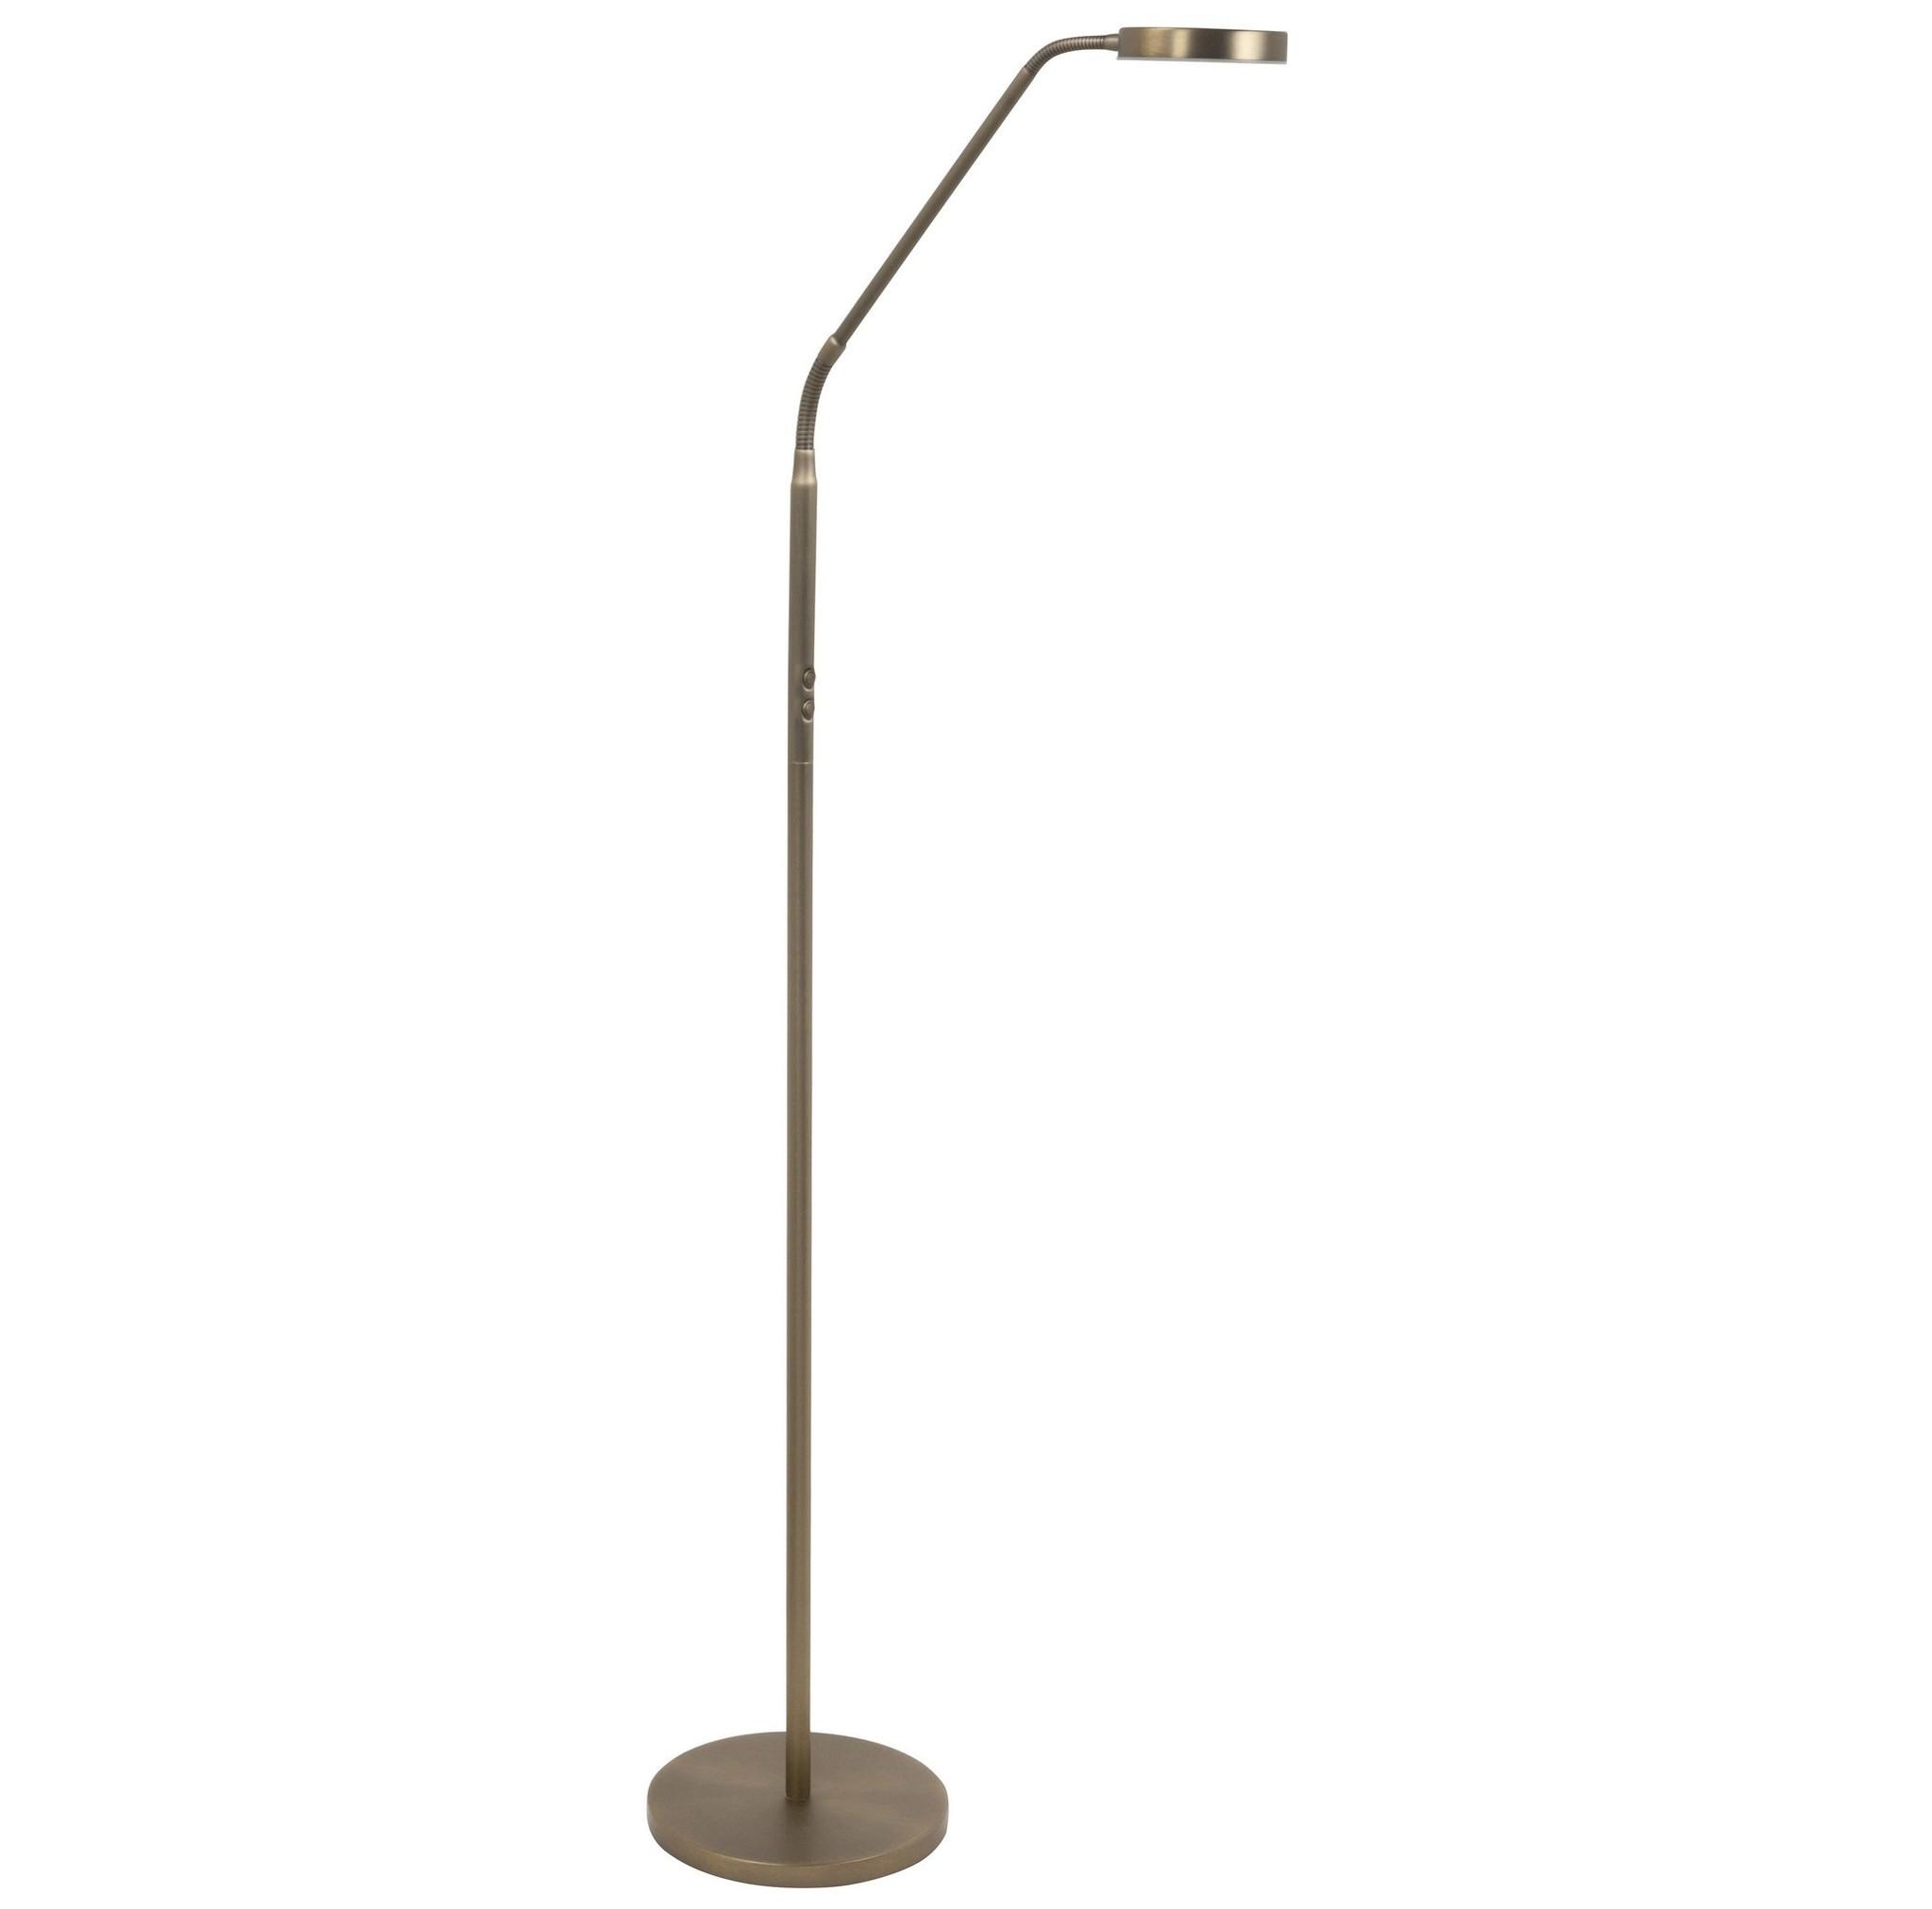 Vloerlamp Comfort Brons Led incl. Dimmer